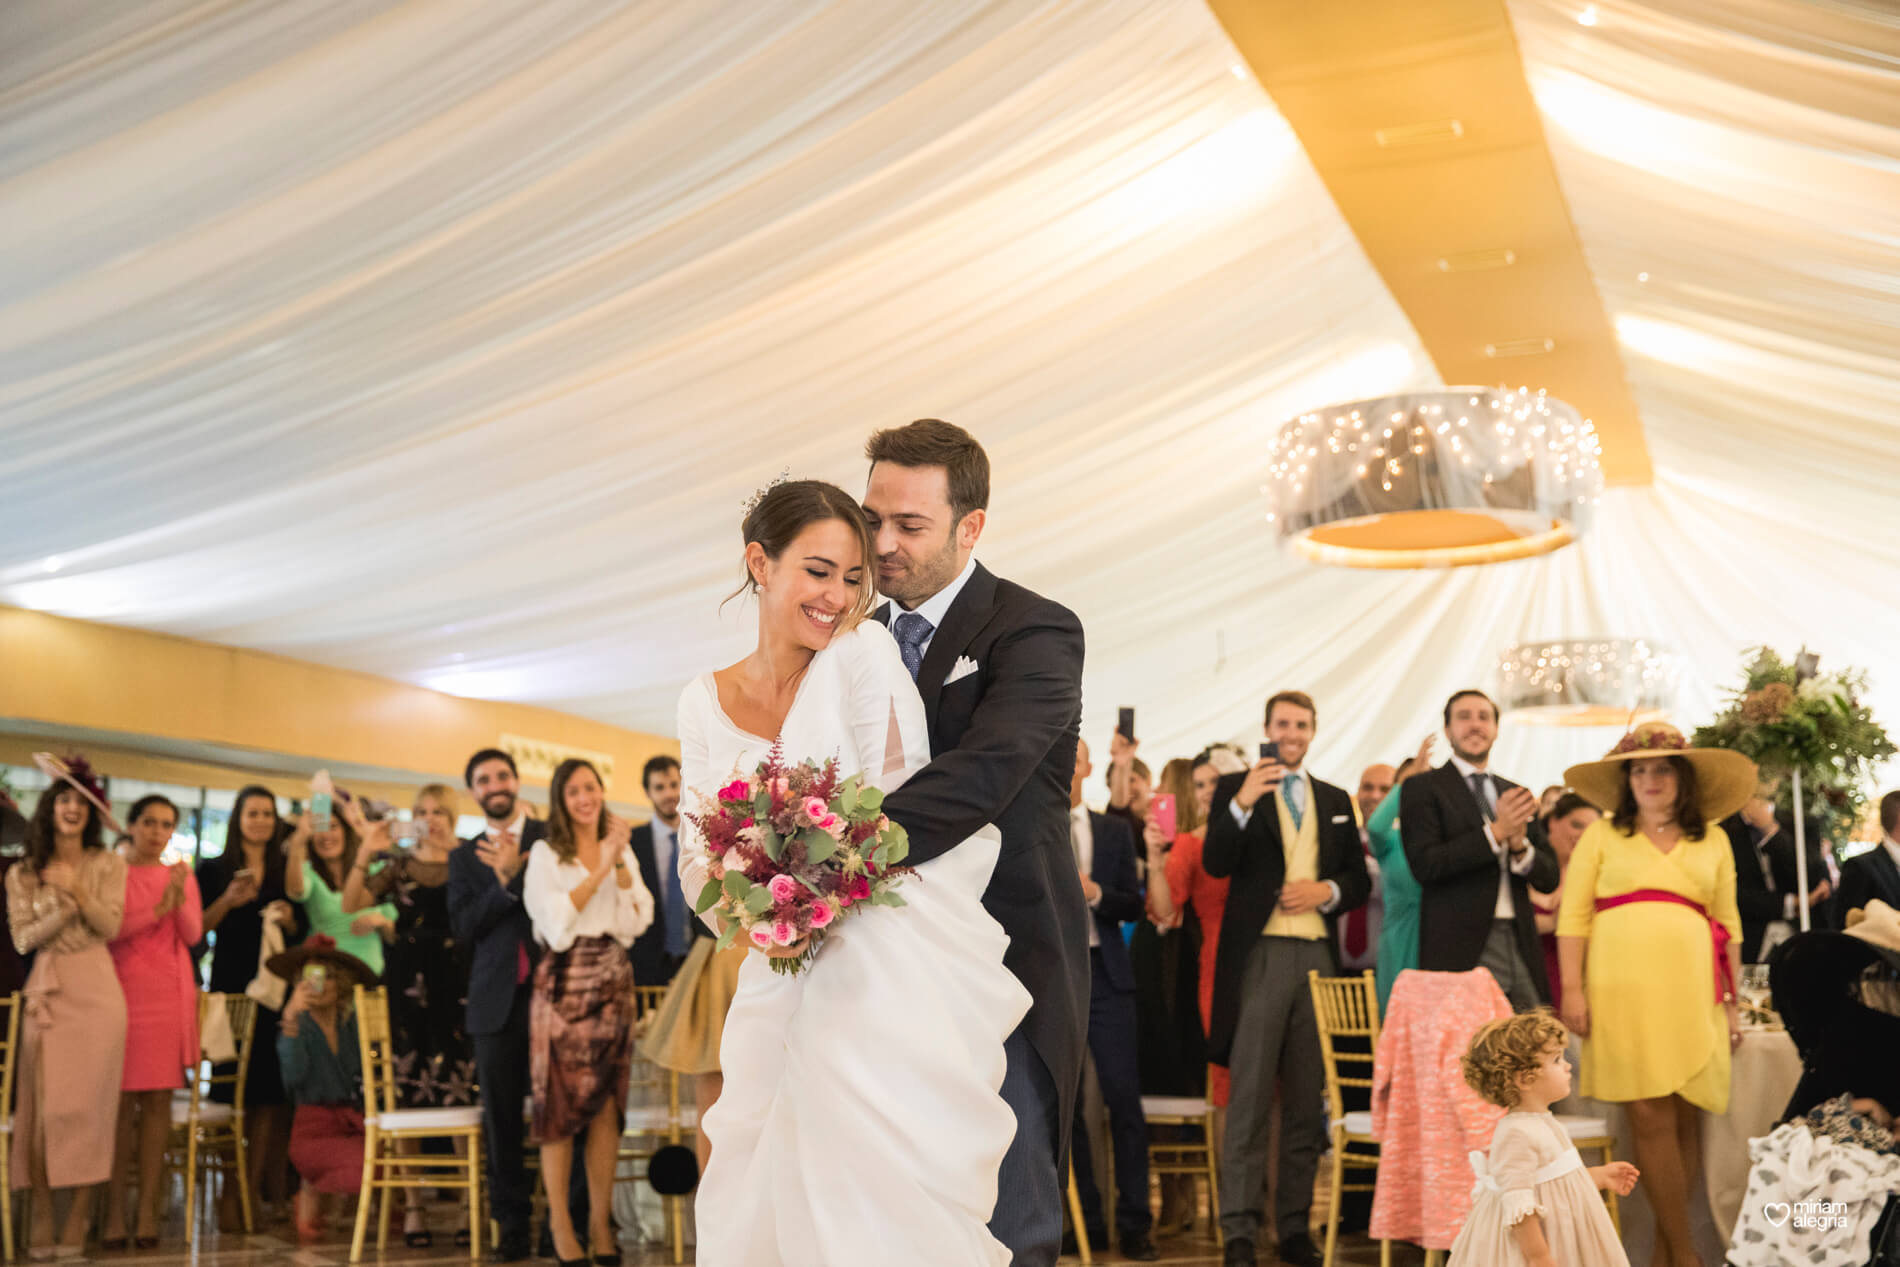 vestido-de-novia-paula-del-vas-miriam-alegria-fotografos-boda-murcia-117